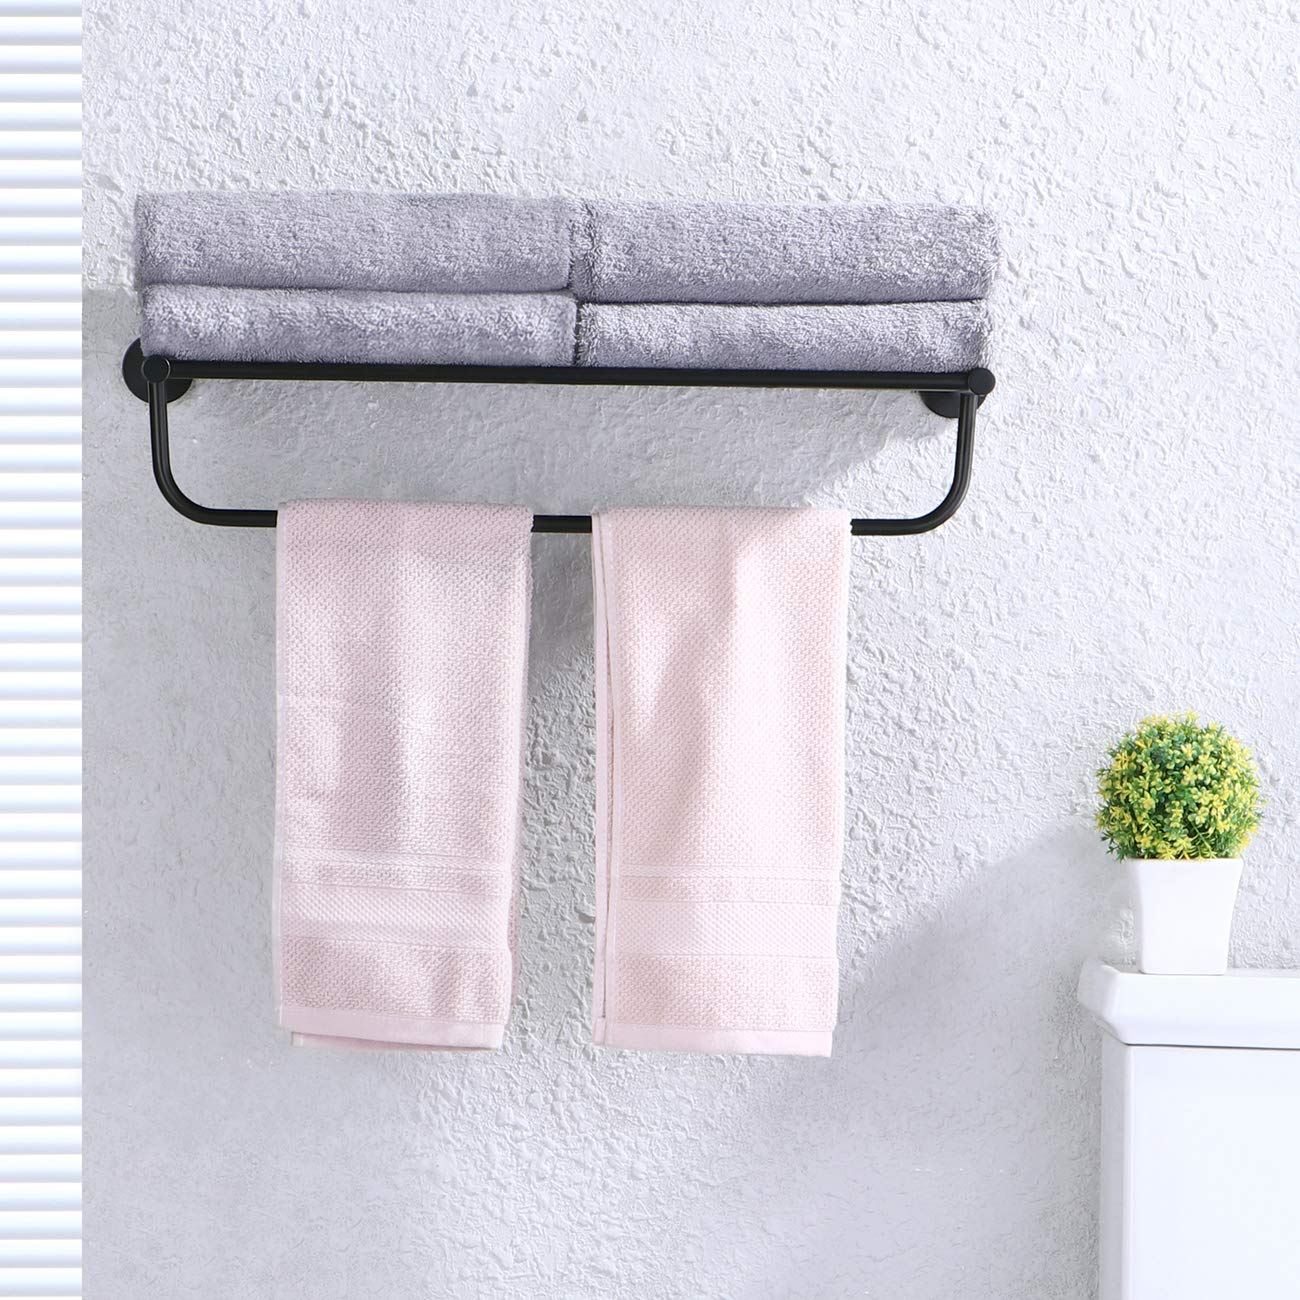 Amazon.com: KES A2110 - Toallero minimalista con barra ...